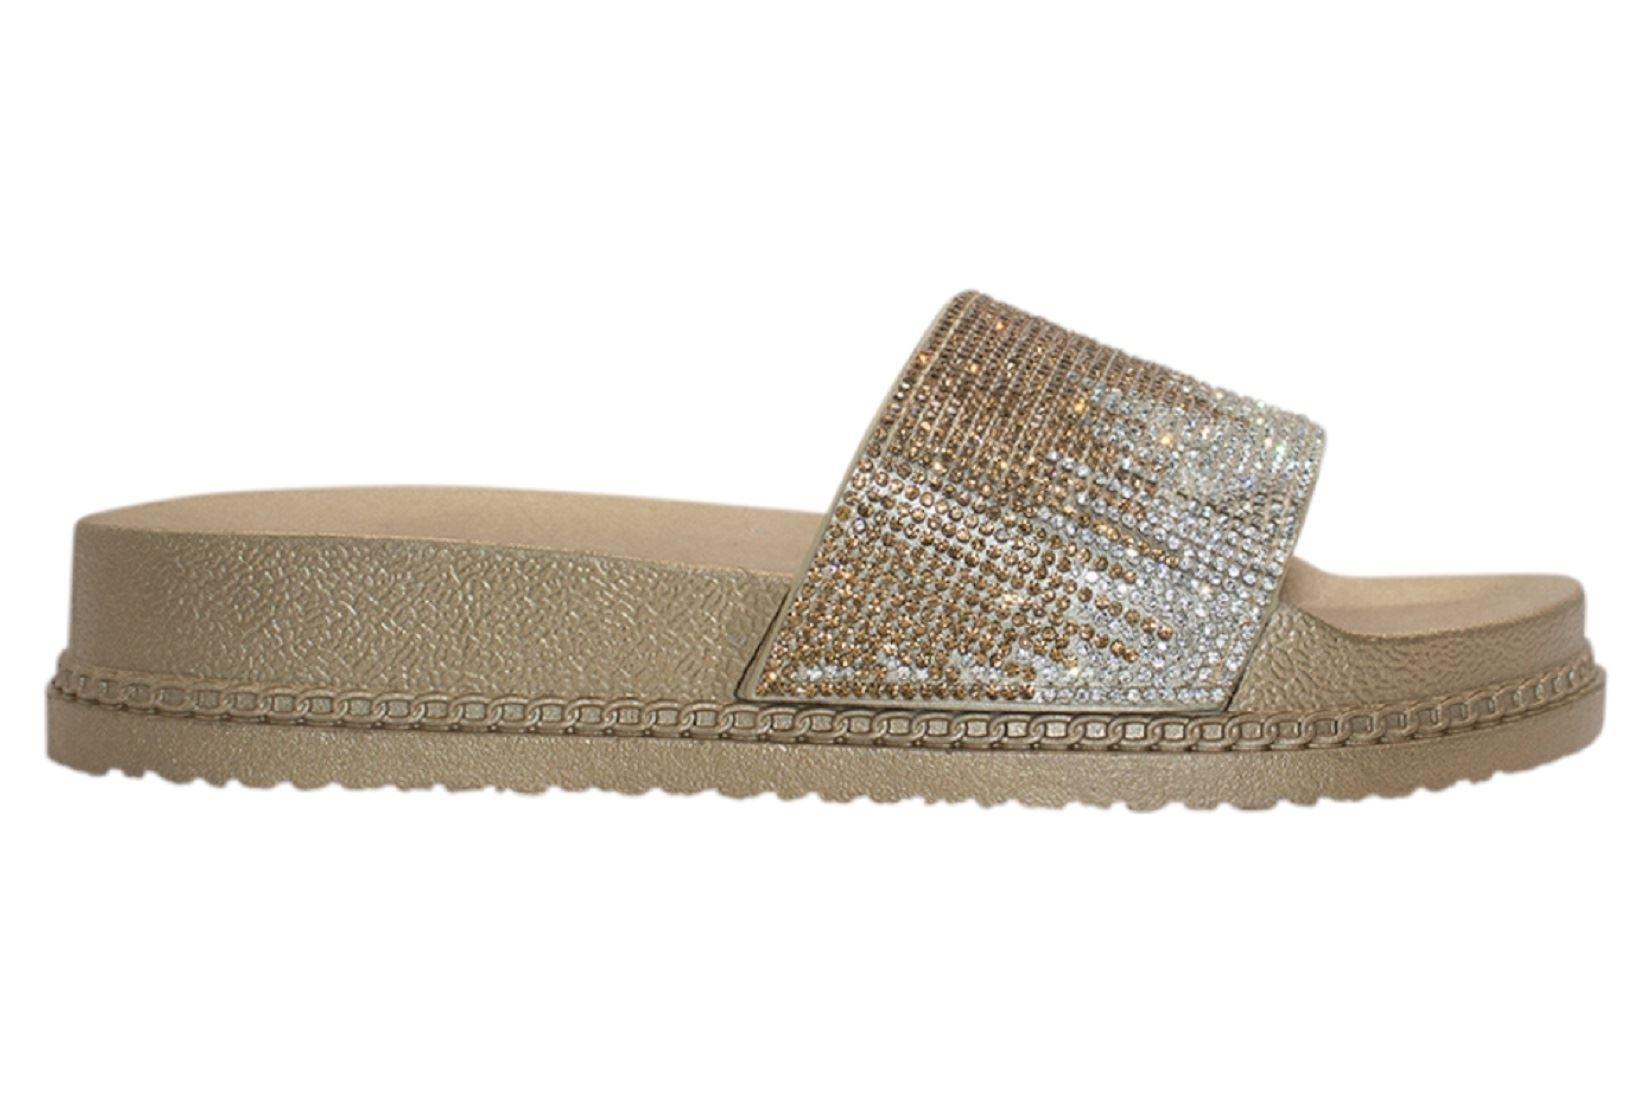 Womens-Sliders-Casual-Slippers-Mules-Ladies-Diamante-Flip-Flop-Sandals-Shoes thumbnail 50